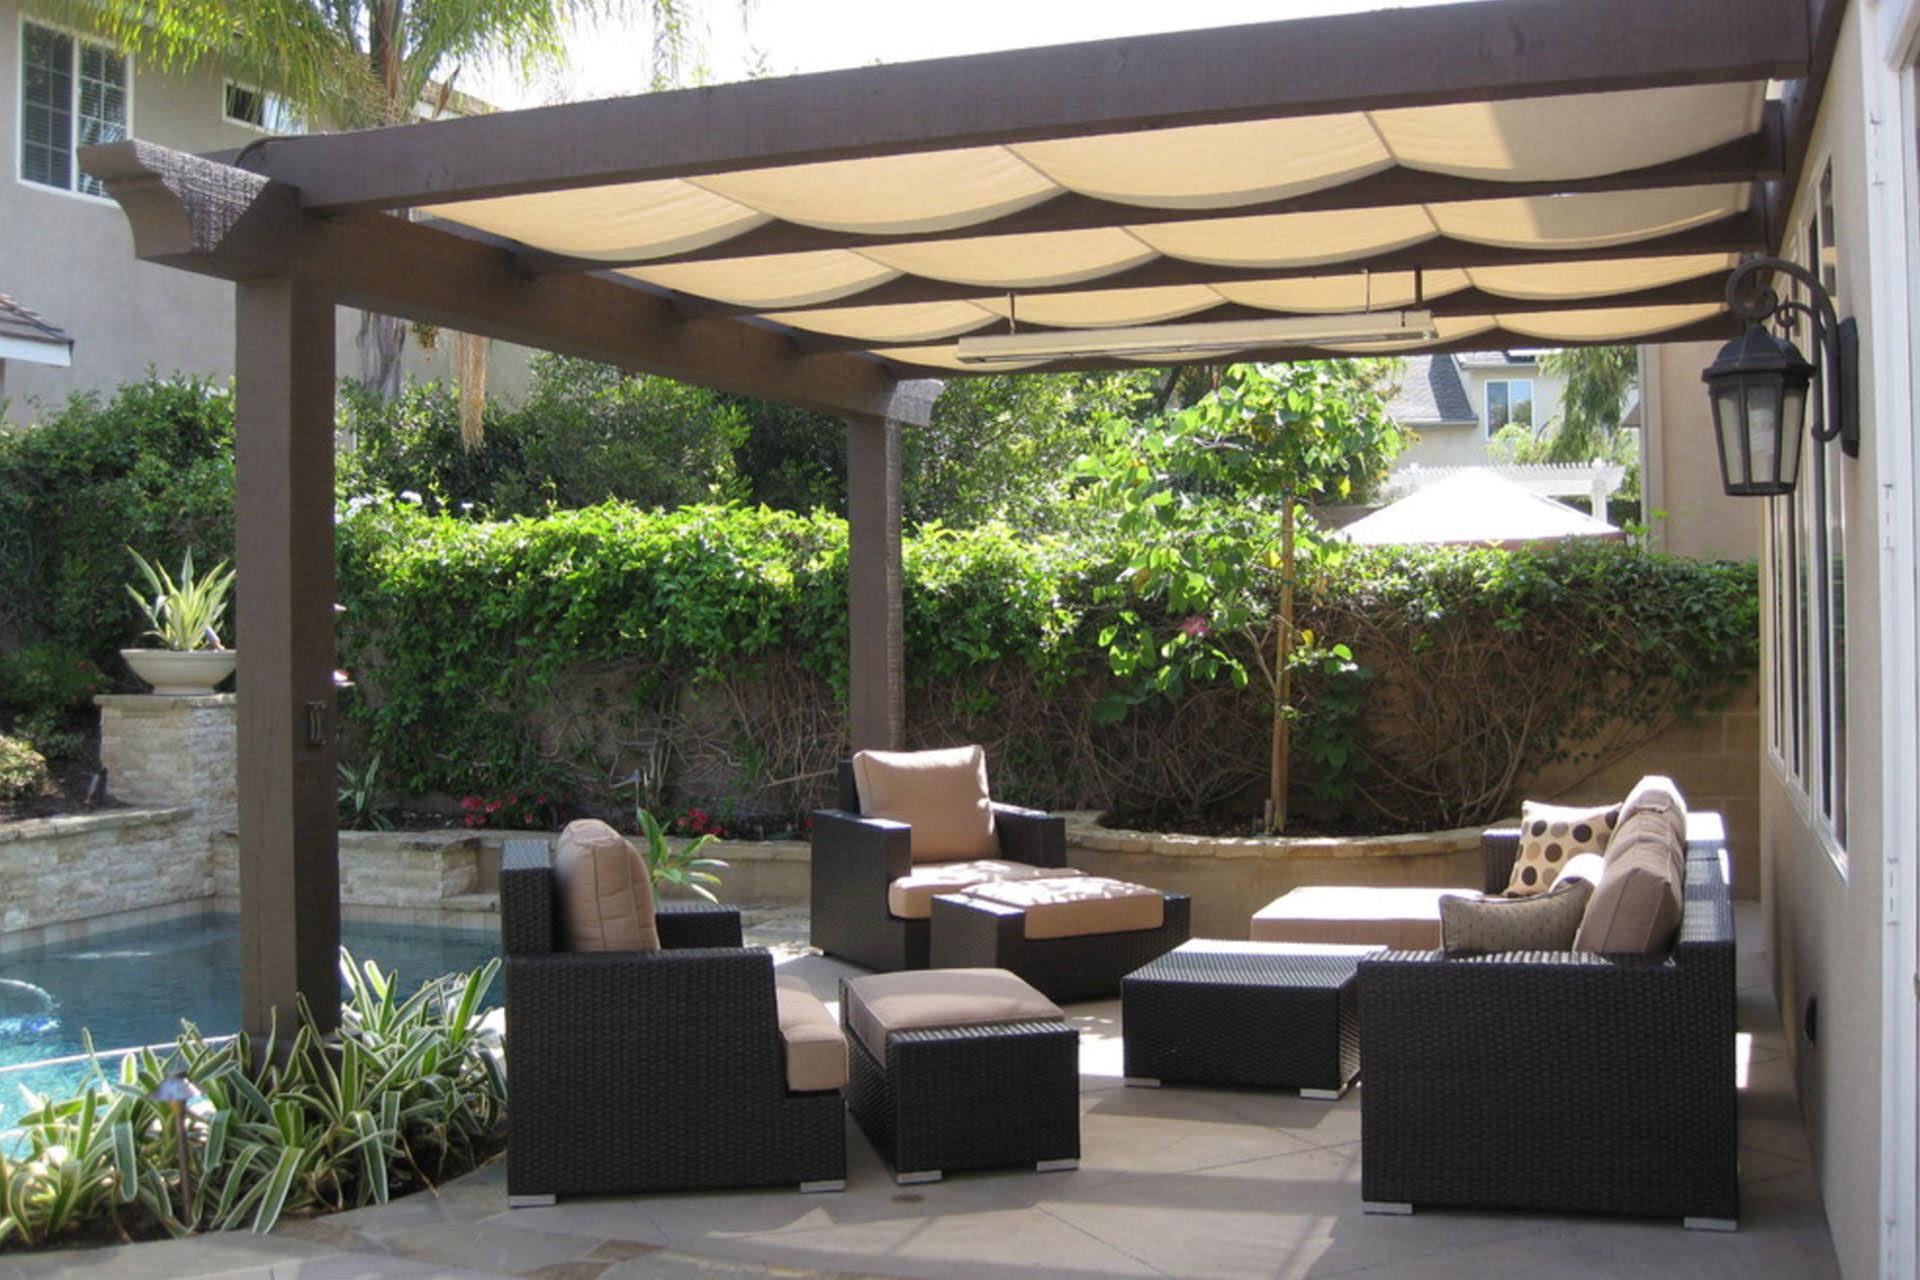 Pergola Shade Pratical Solutions for Every Outdoor Space